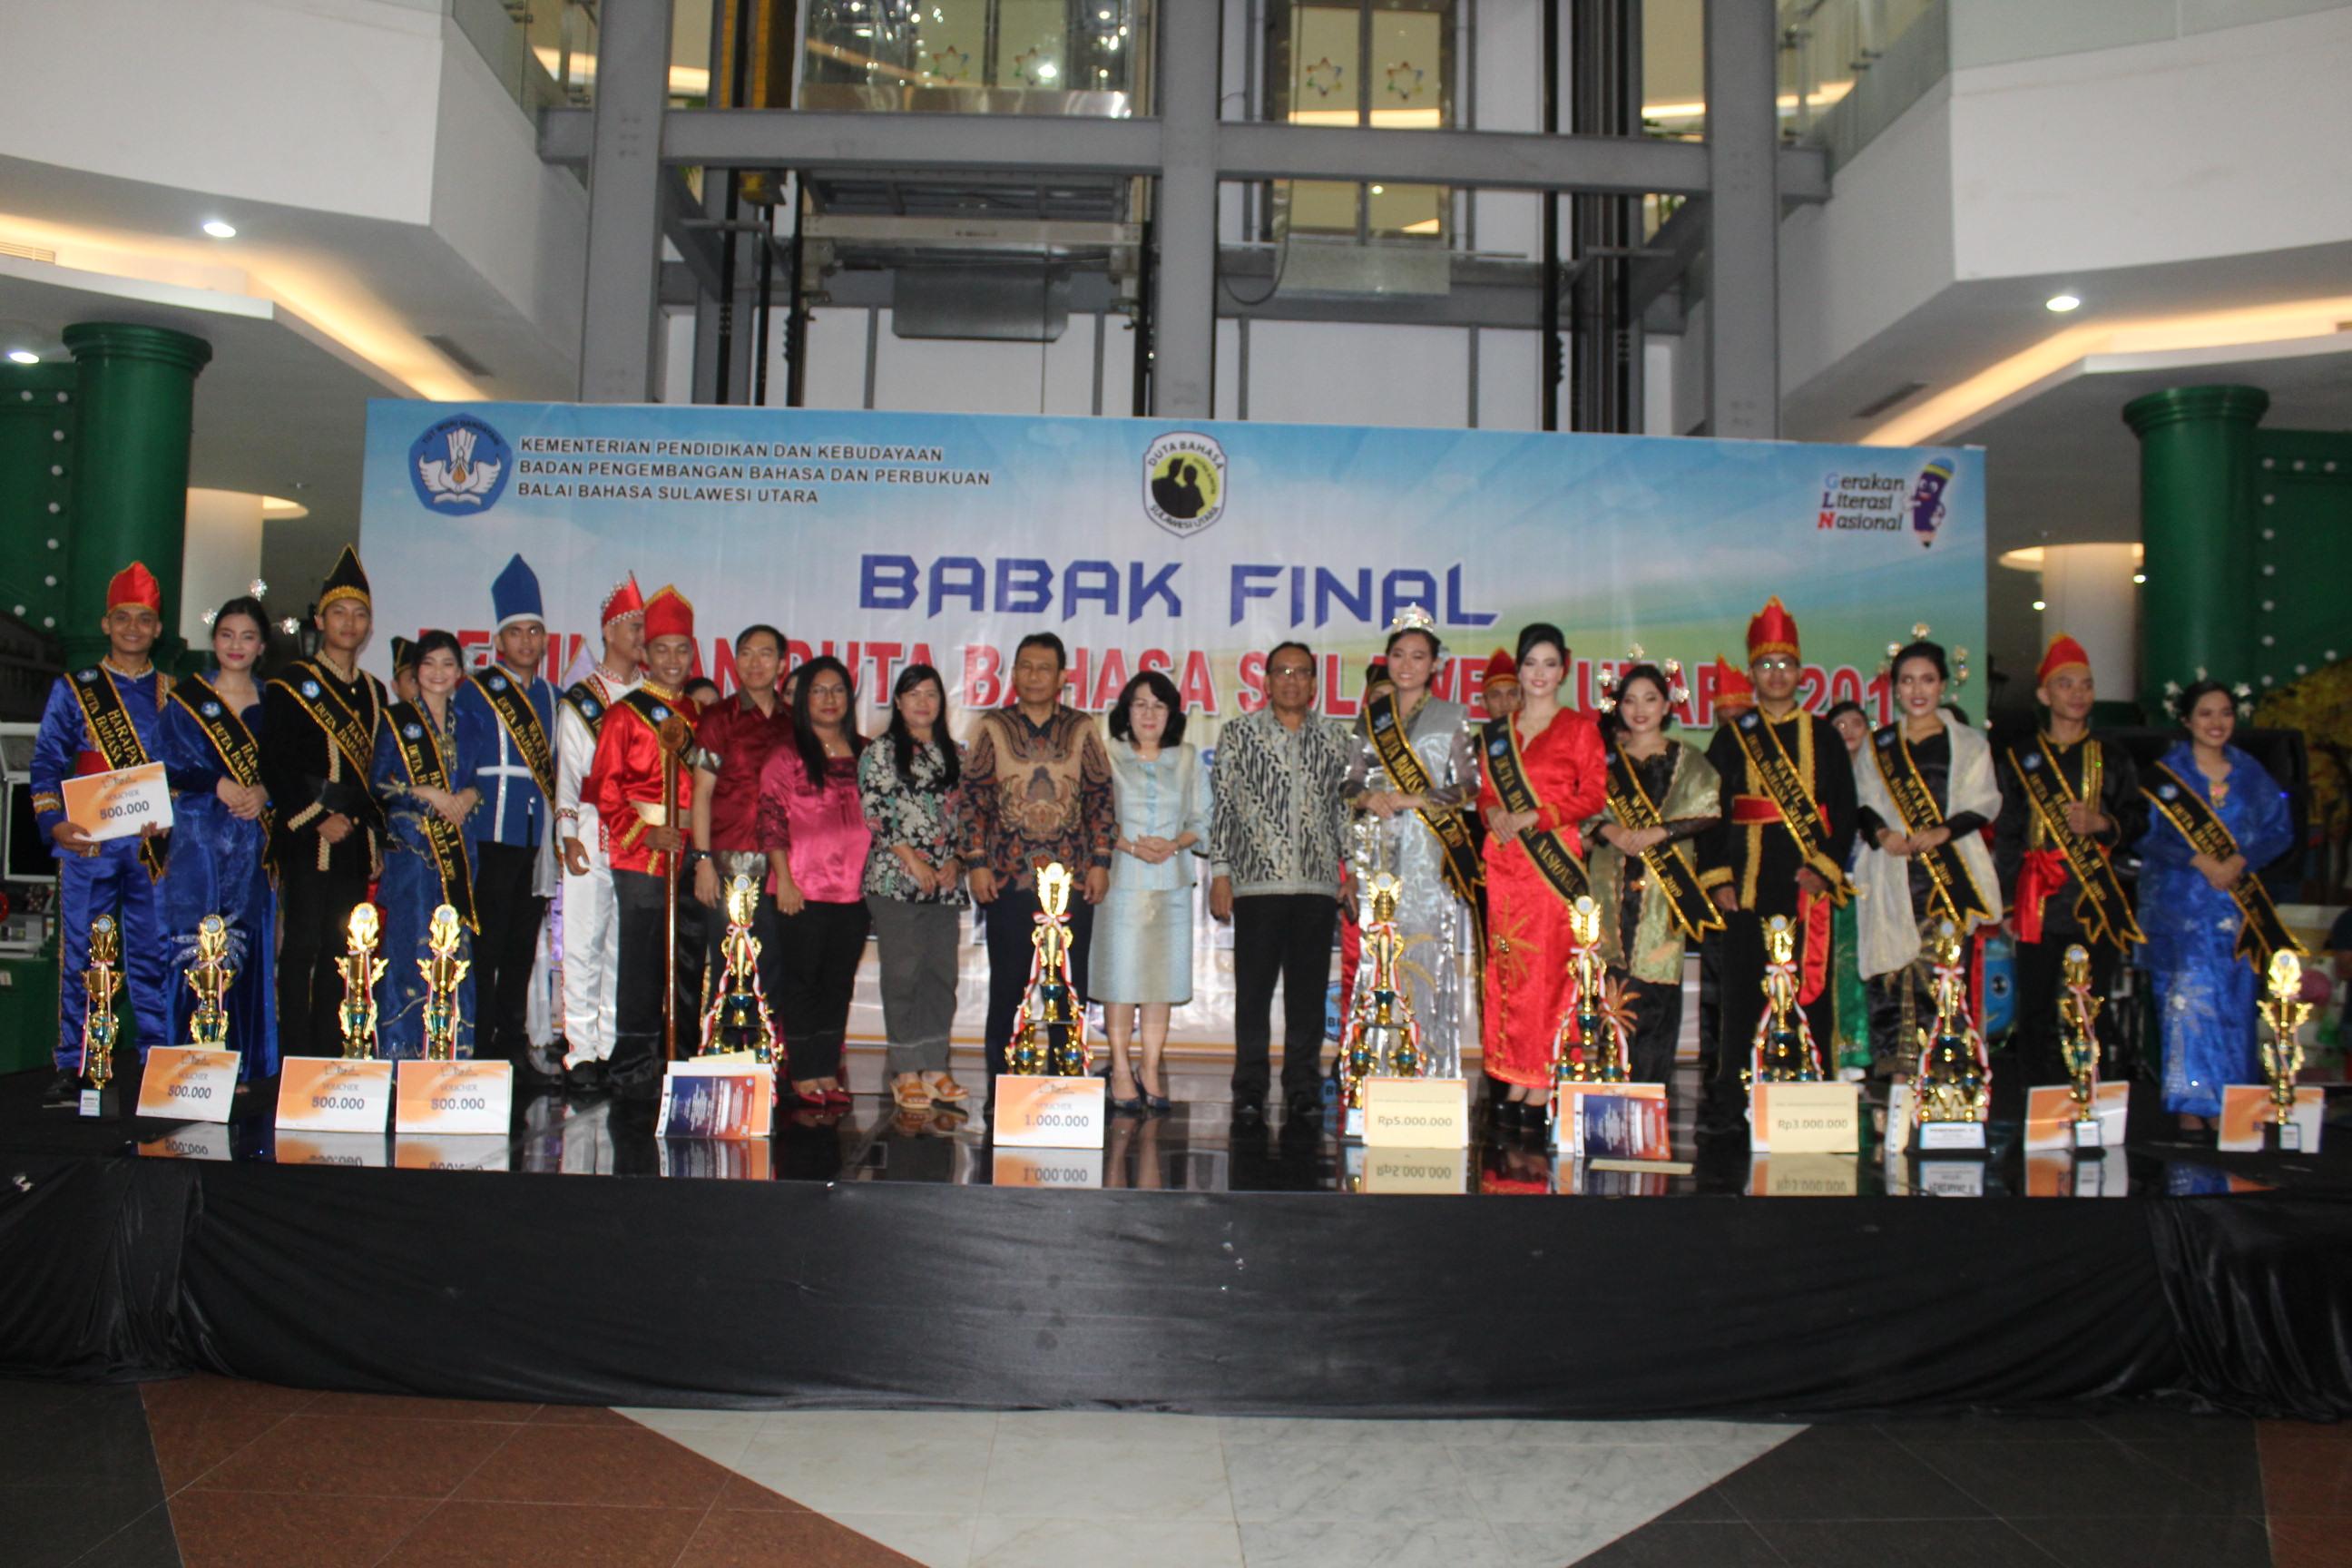 Pemilihan Duta Bahasa Sulawesi Utara Tahun 2019